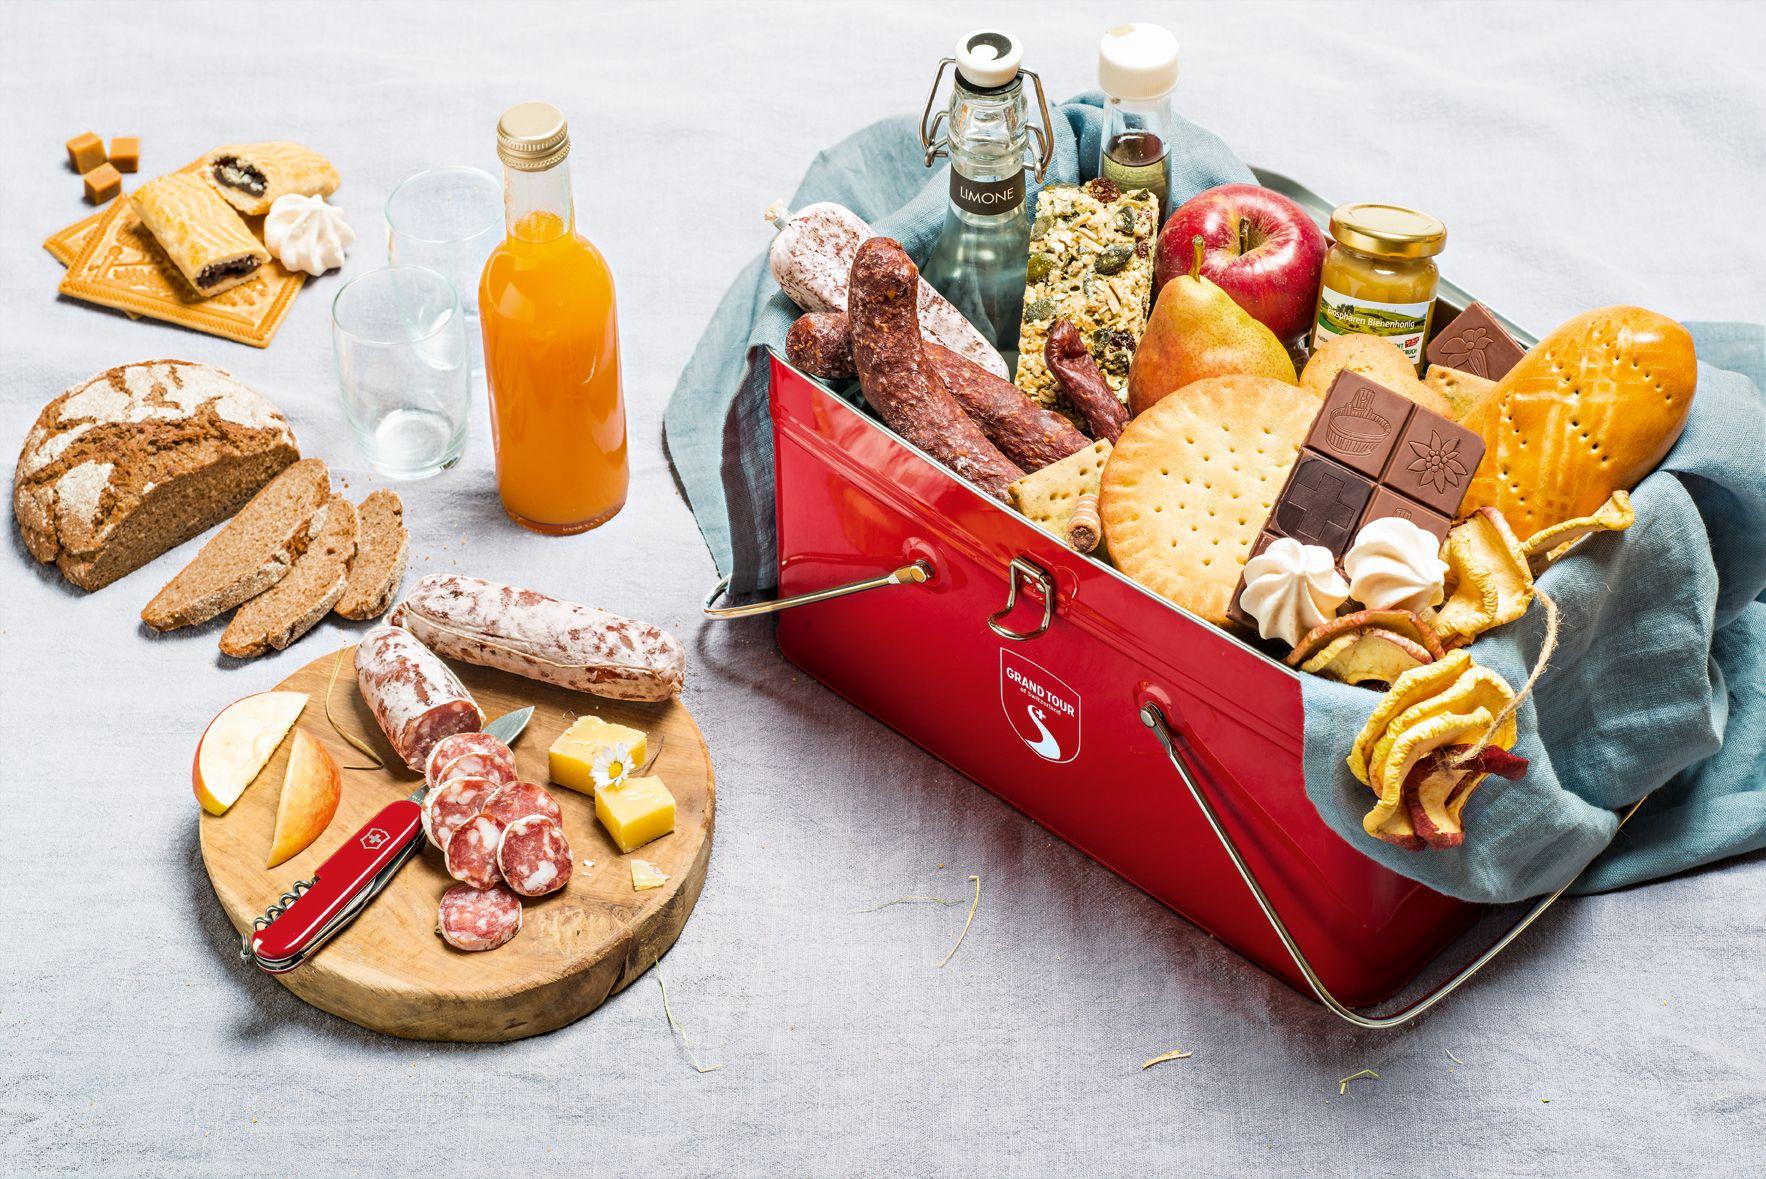 The Grand Tour Snack Box